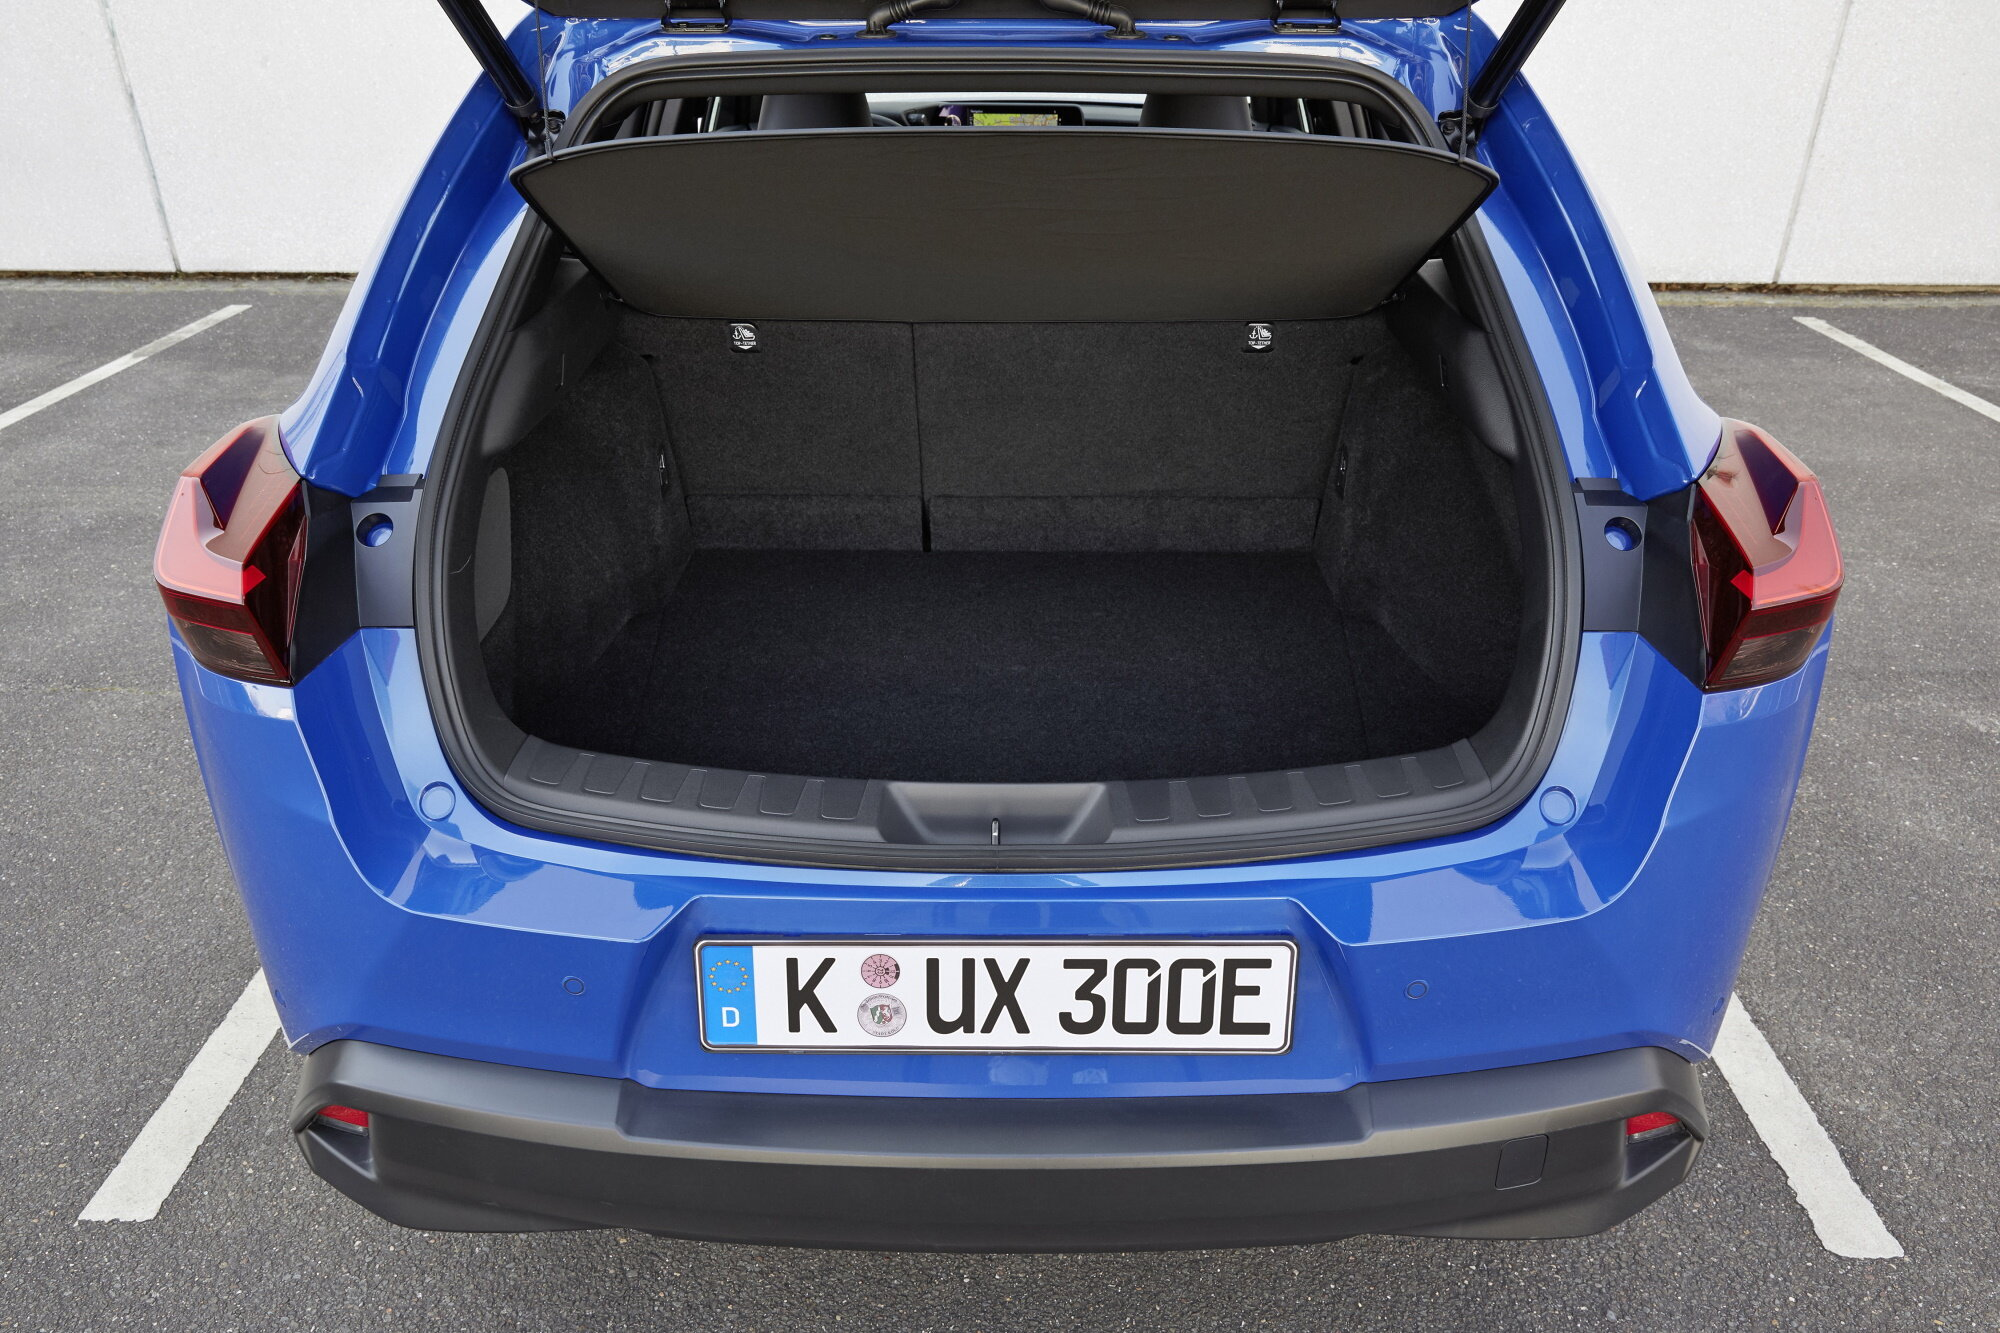 Lexus ux 300e электрический кроссовер: характеристики, цена, дизайн